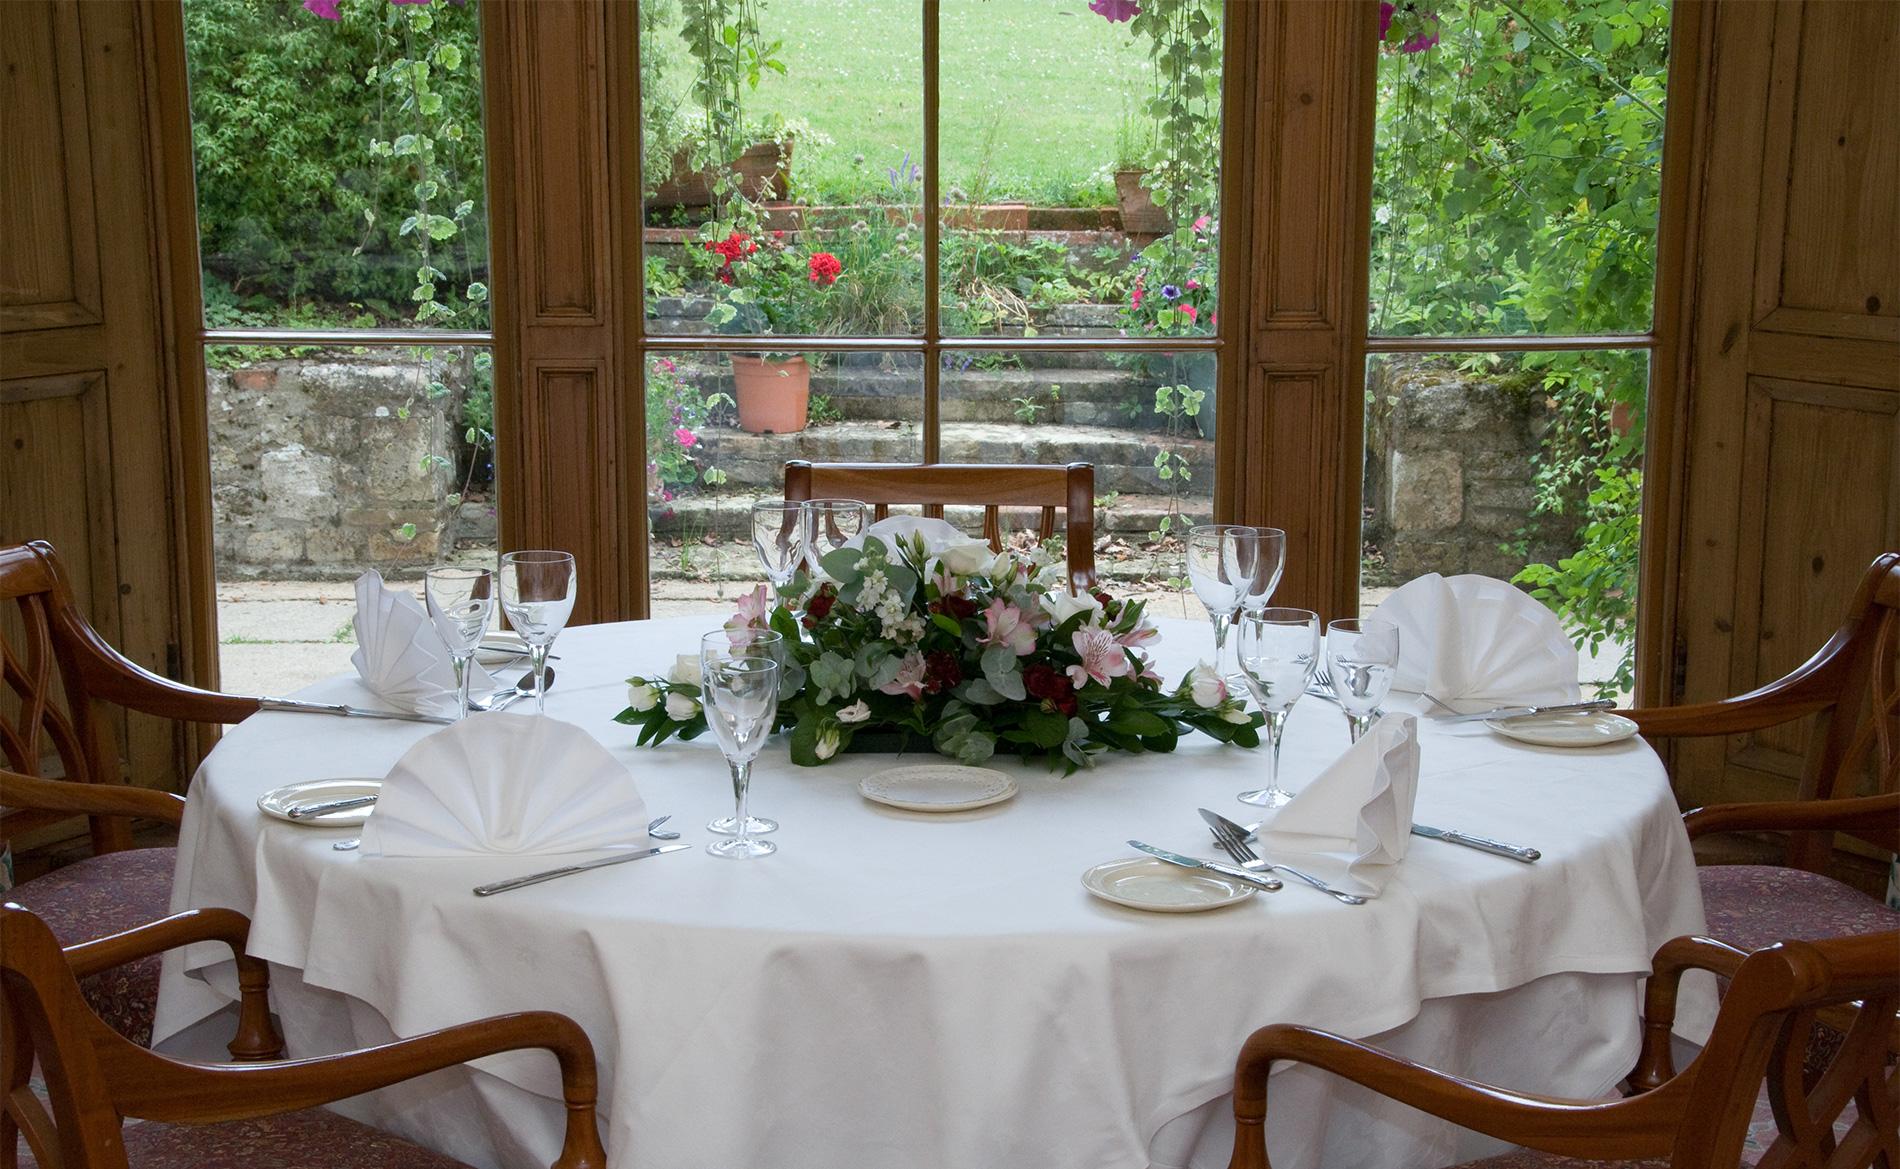 Dining at Stower Grange Hotel in Norfolk.